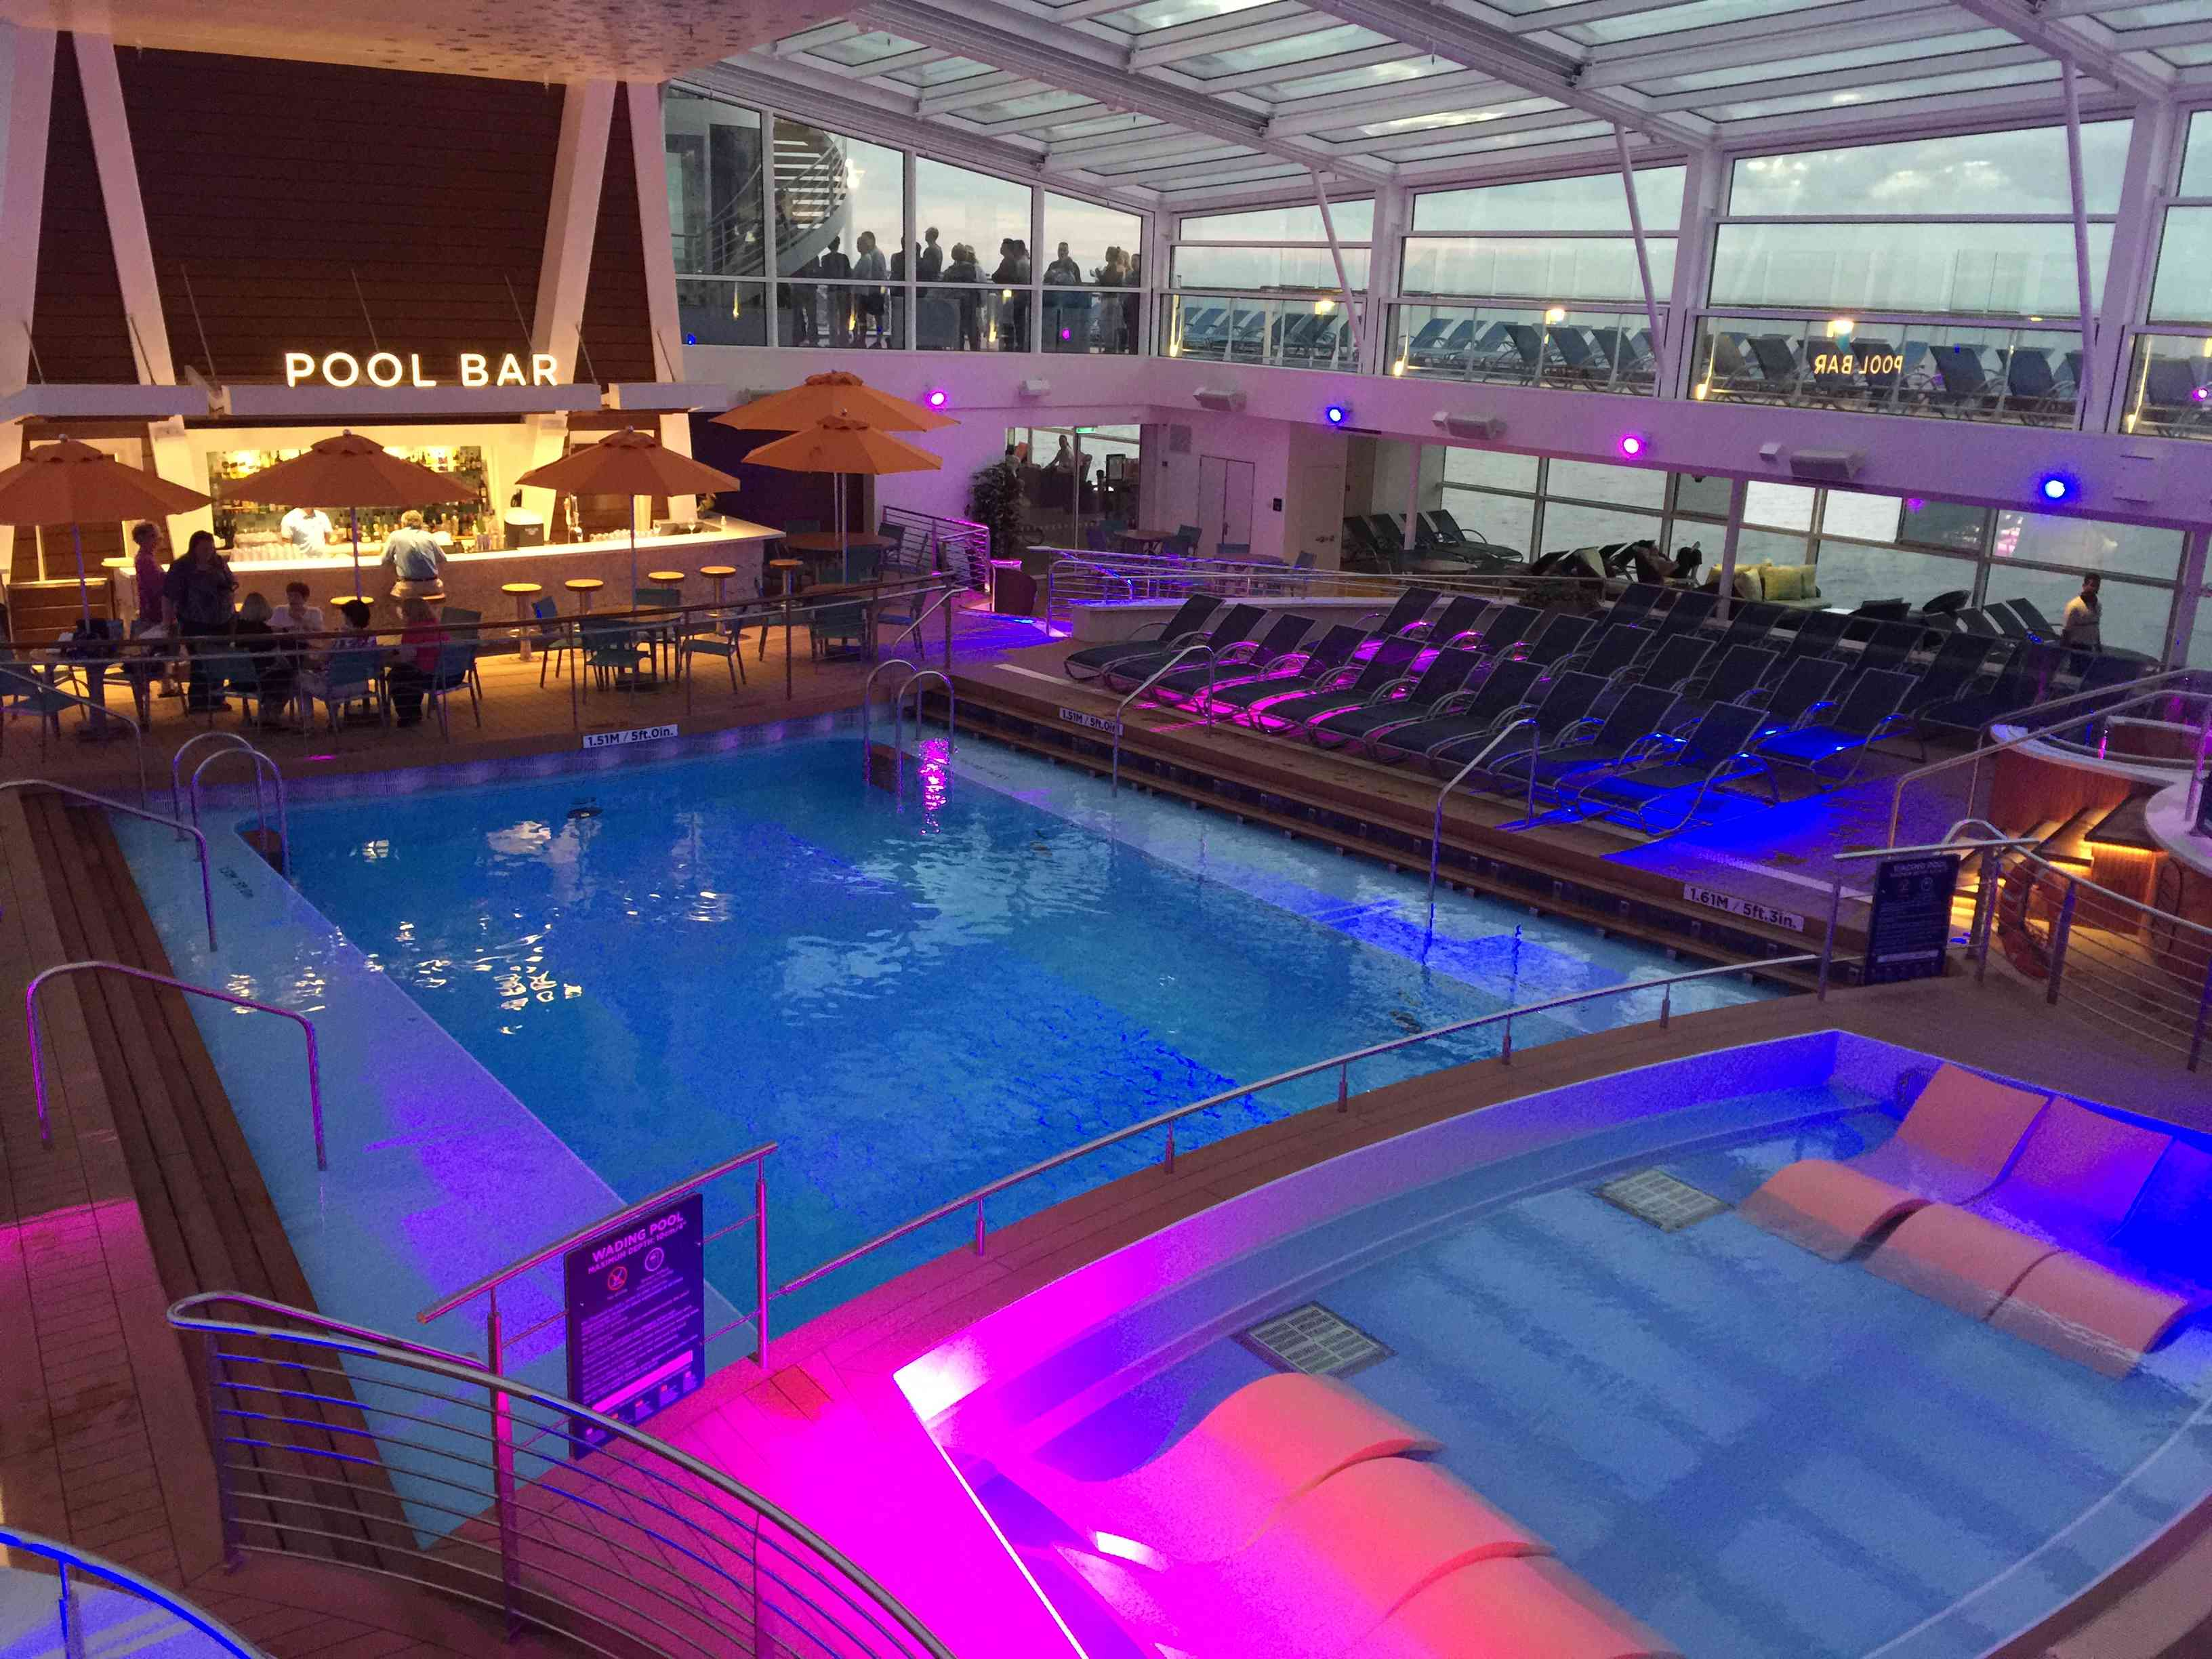 Anthem of the Seas pool bar